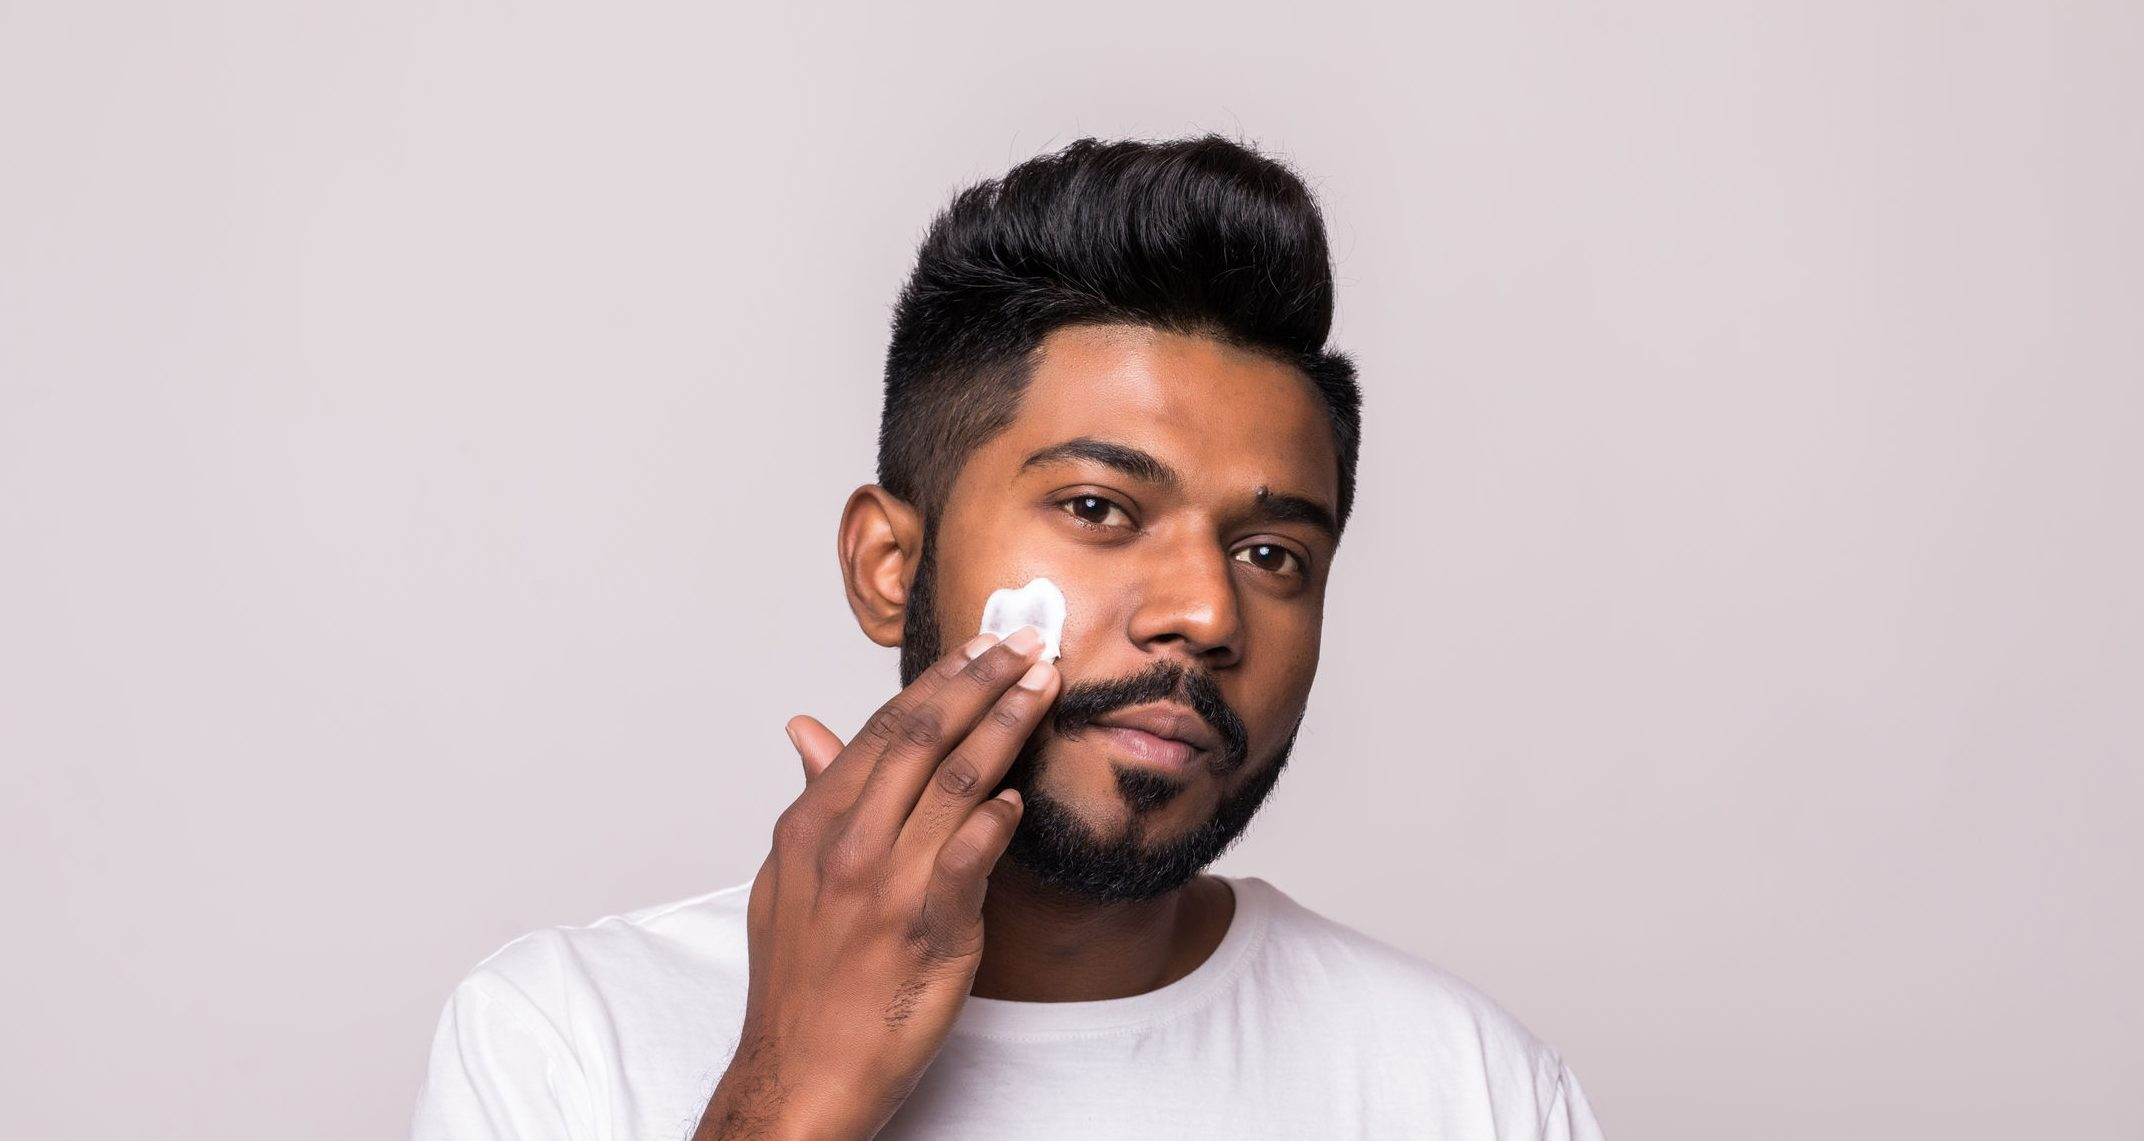 man using shaving cream